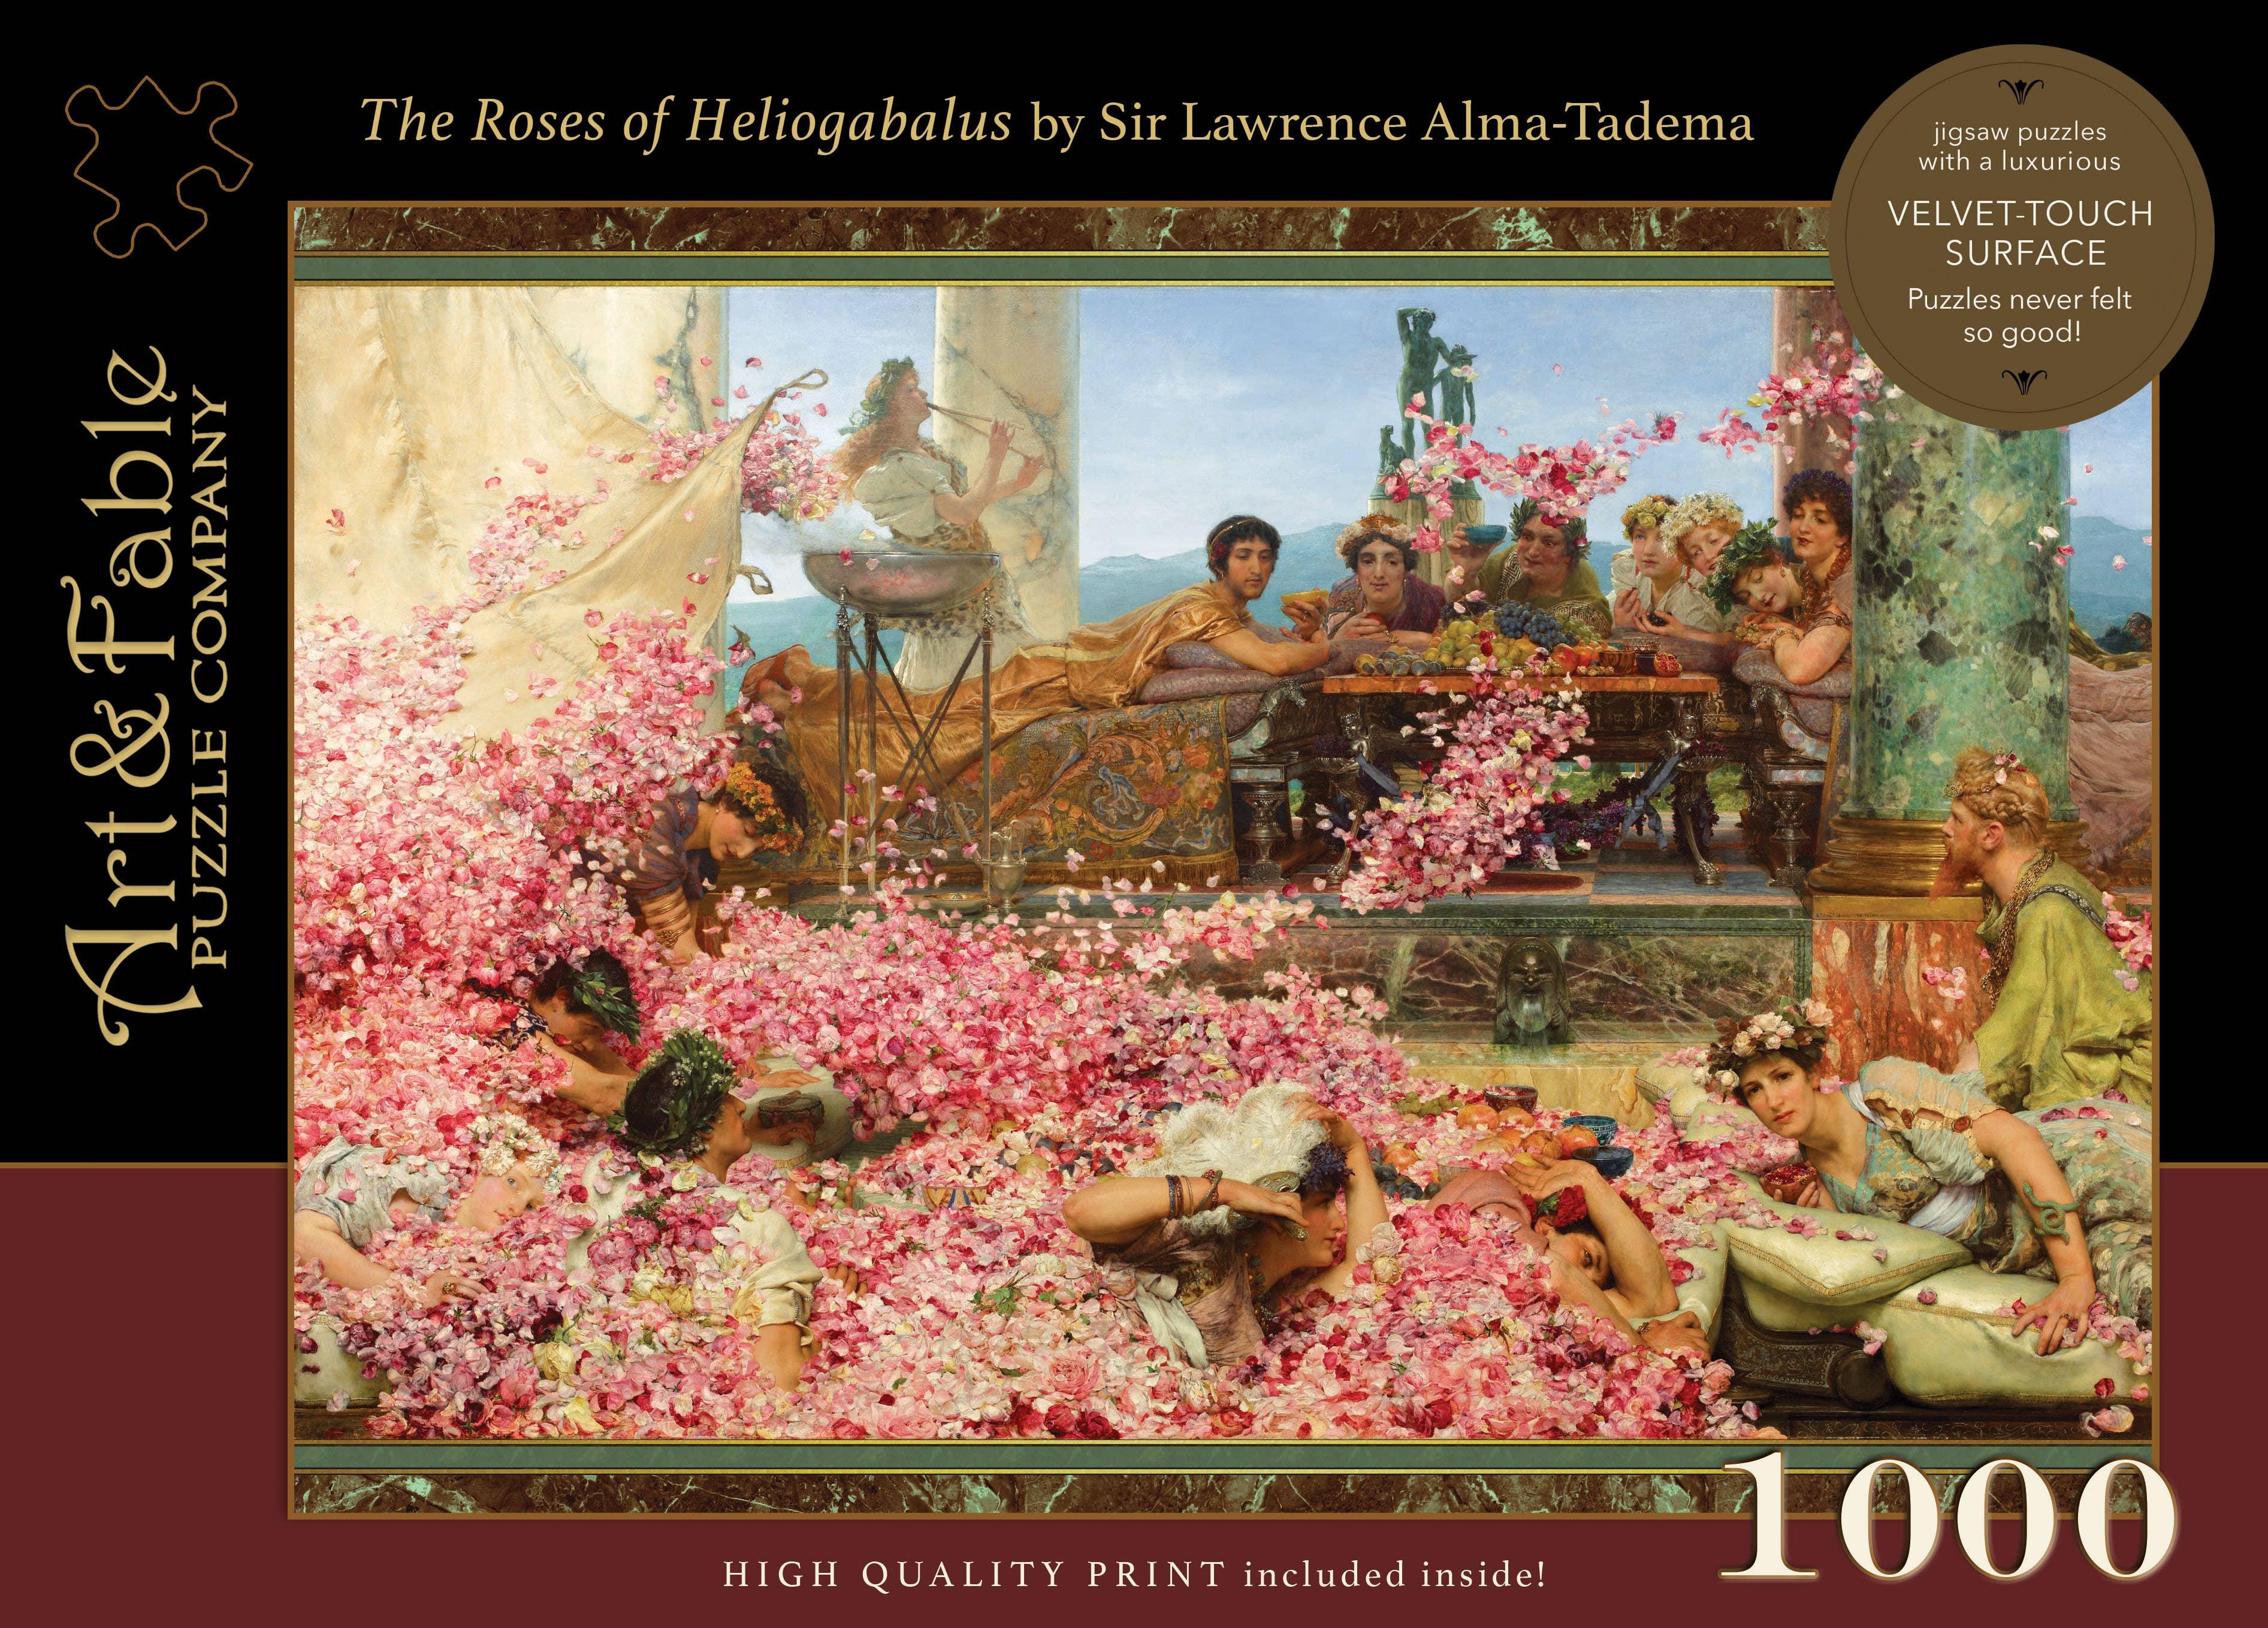 The Roses of Heliogabalus, 1000-pc Velvet-Touch Puzzle | Trada Marketplace